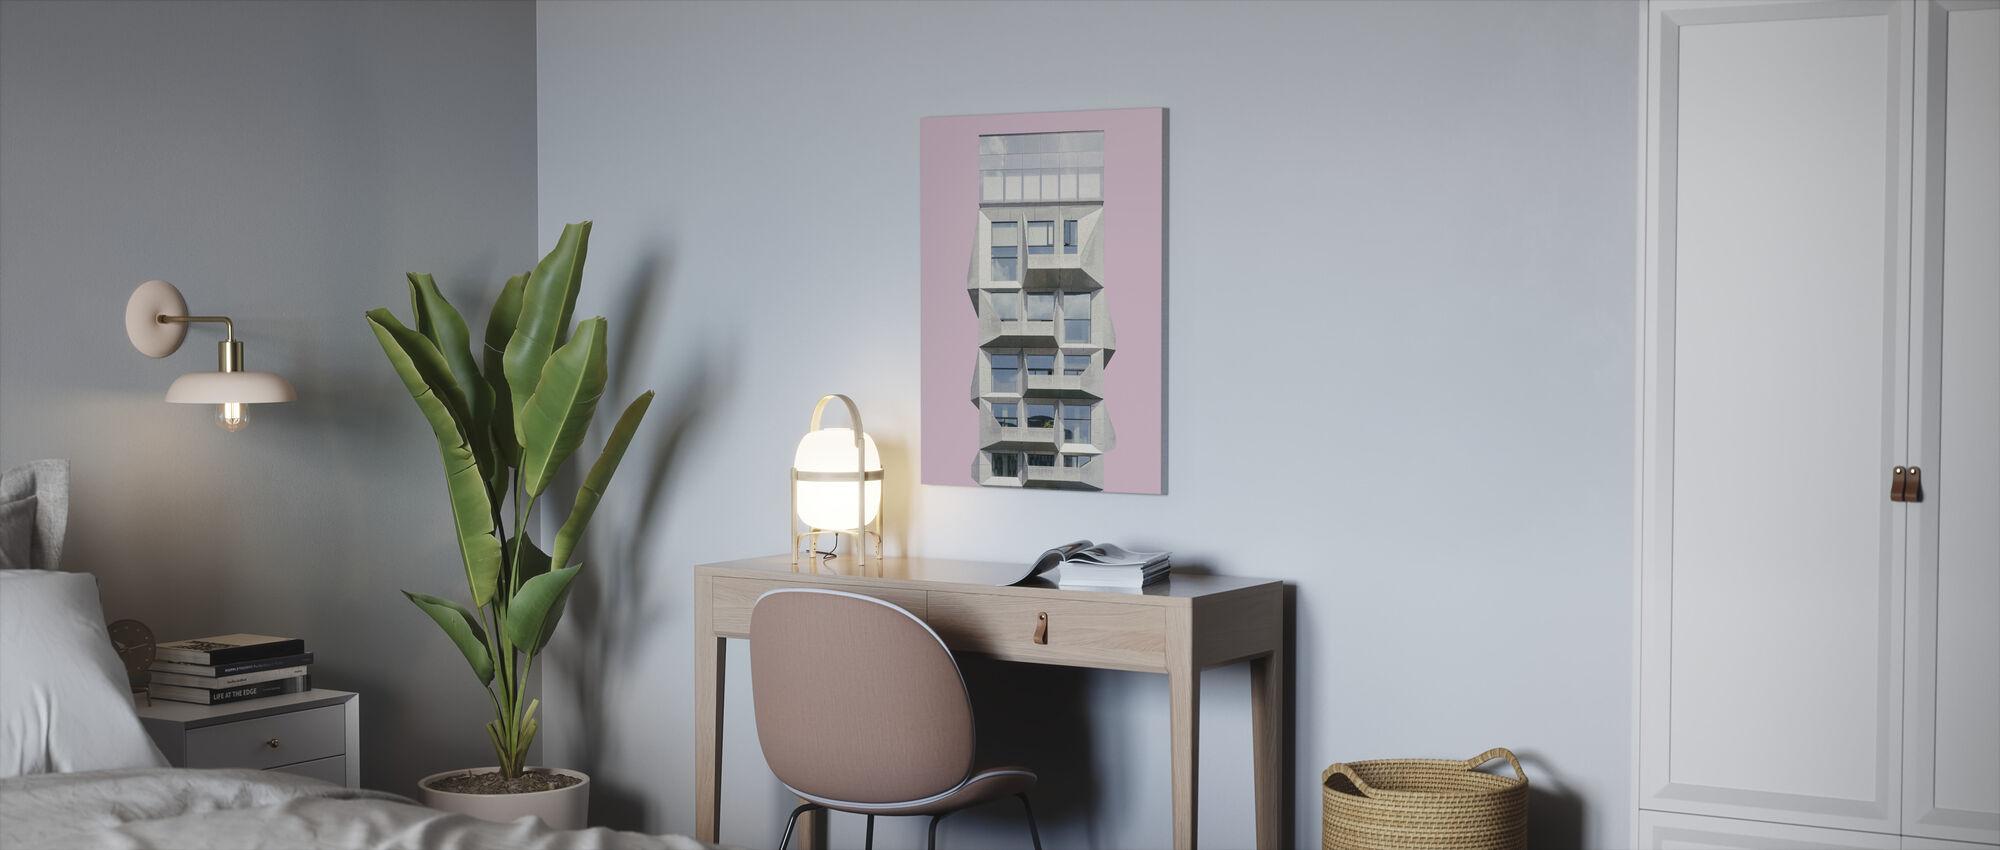 Silo in Copenhagen - Canvas print - Office